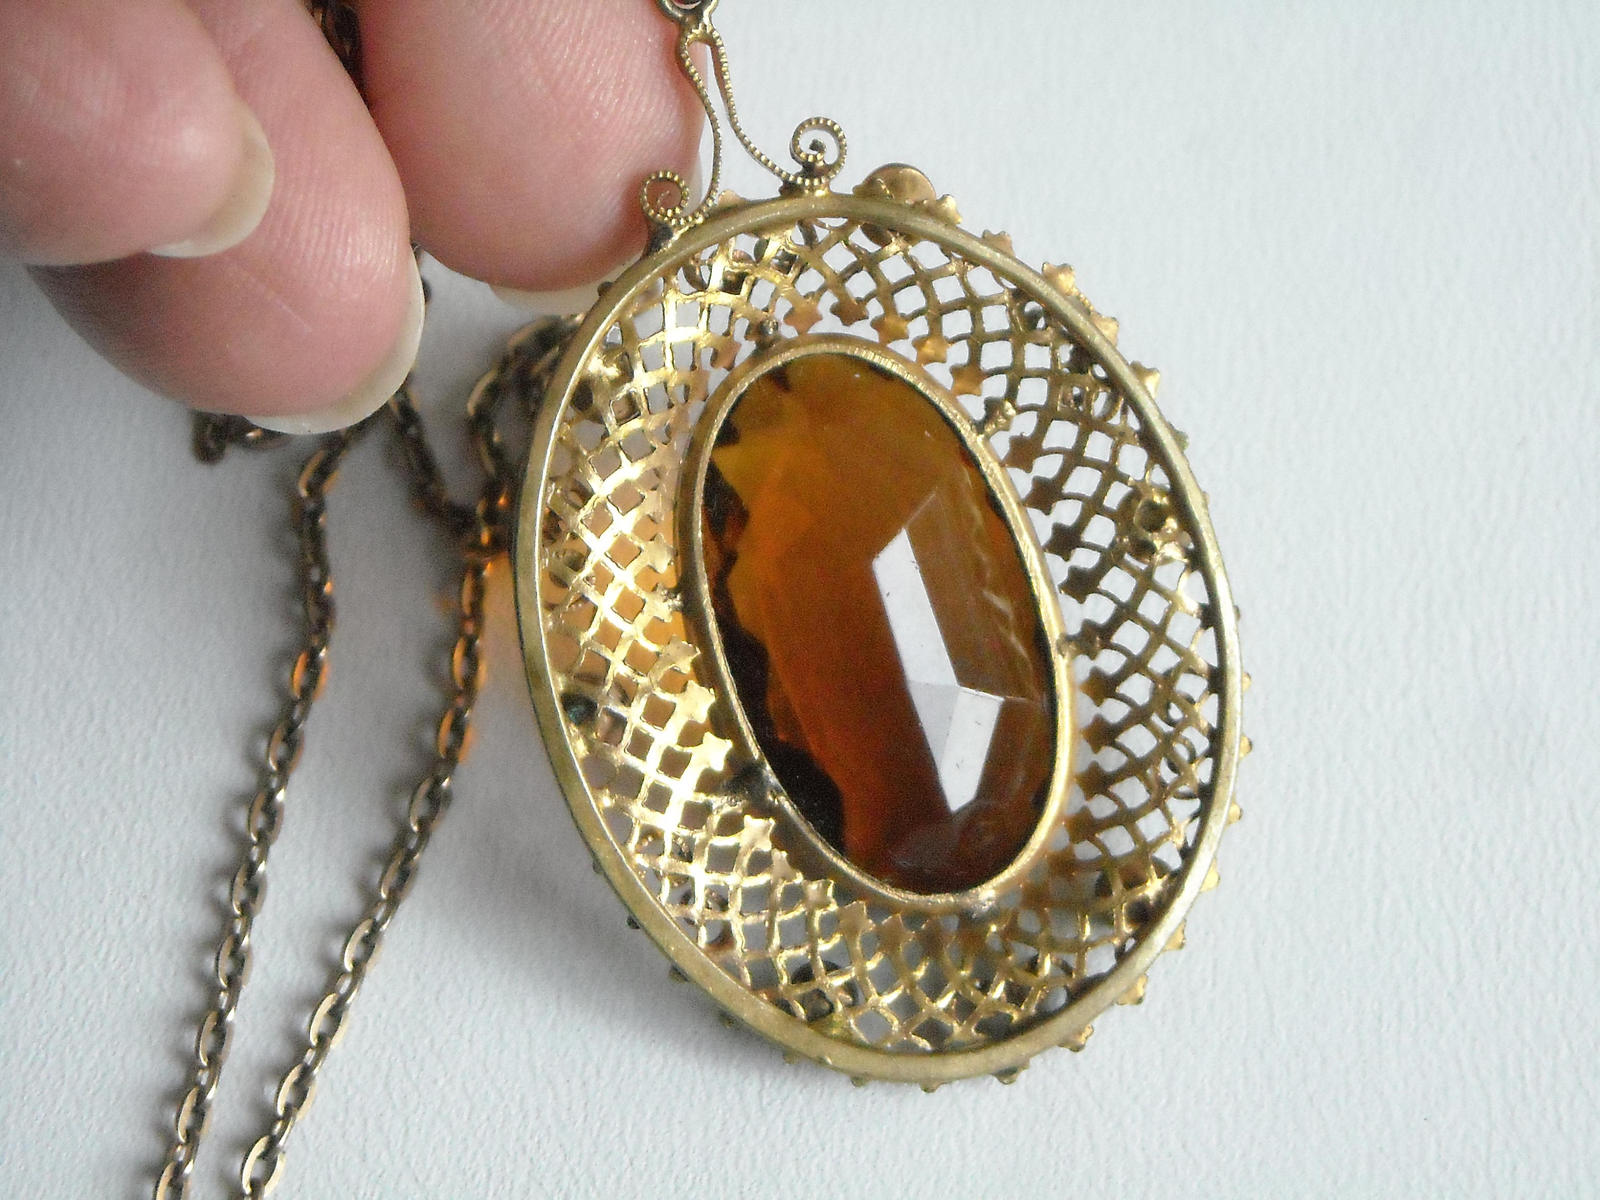 Vintage Gold Tone Filigree Necklace With A Golden Amber Glass Center & Side Sets image 2